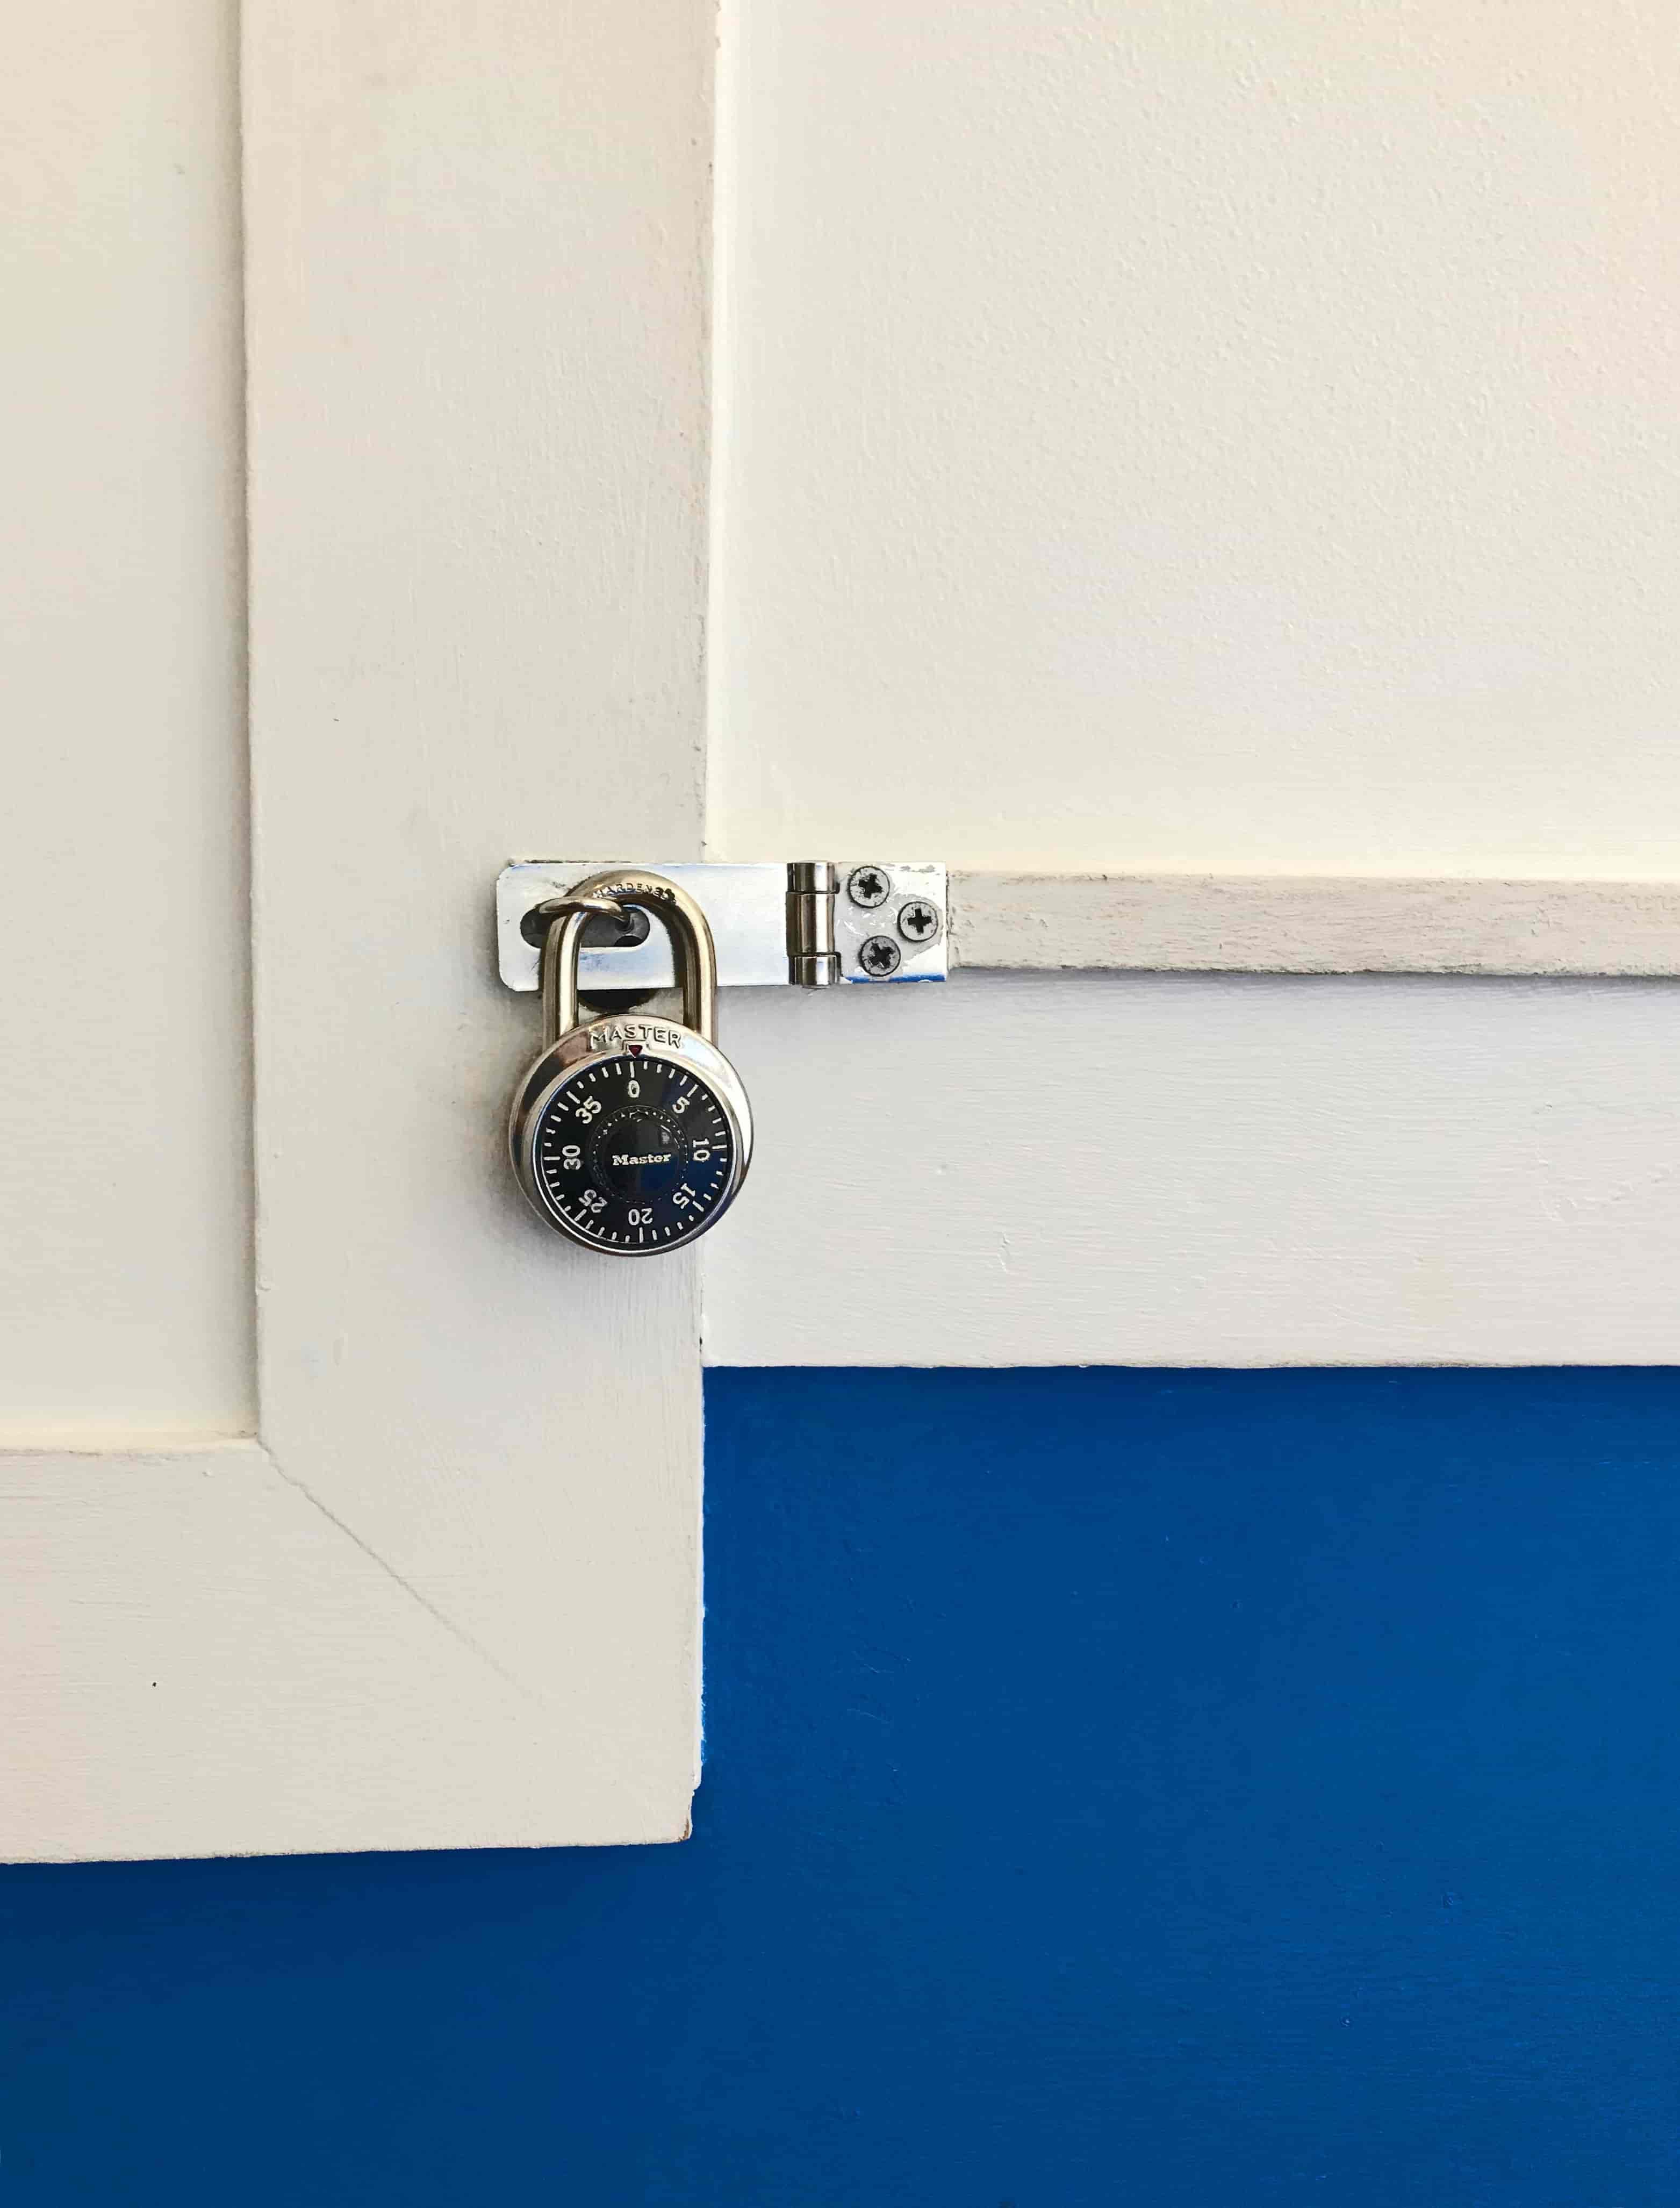 Keep sensitive data locked securely away